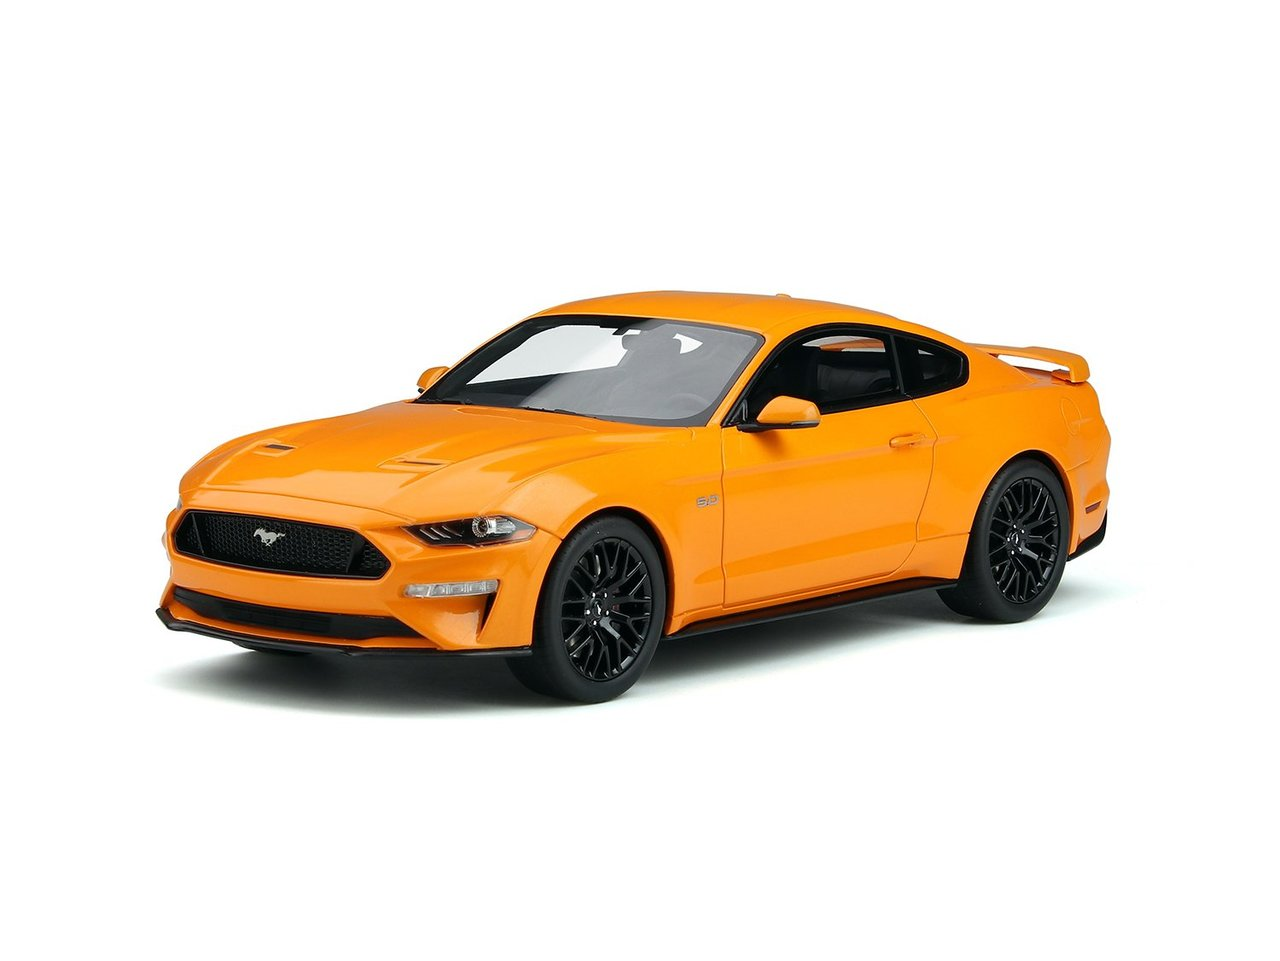 2019 Ford Mustang GT 5.0 Orange Fury 1/18 Model Car by GT Spirit